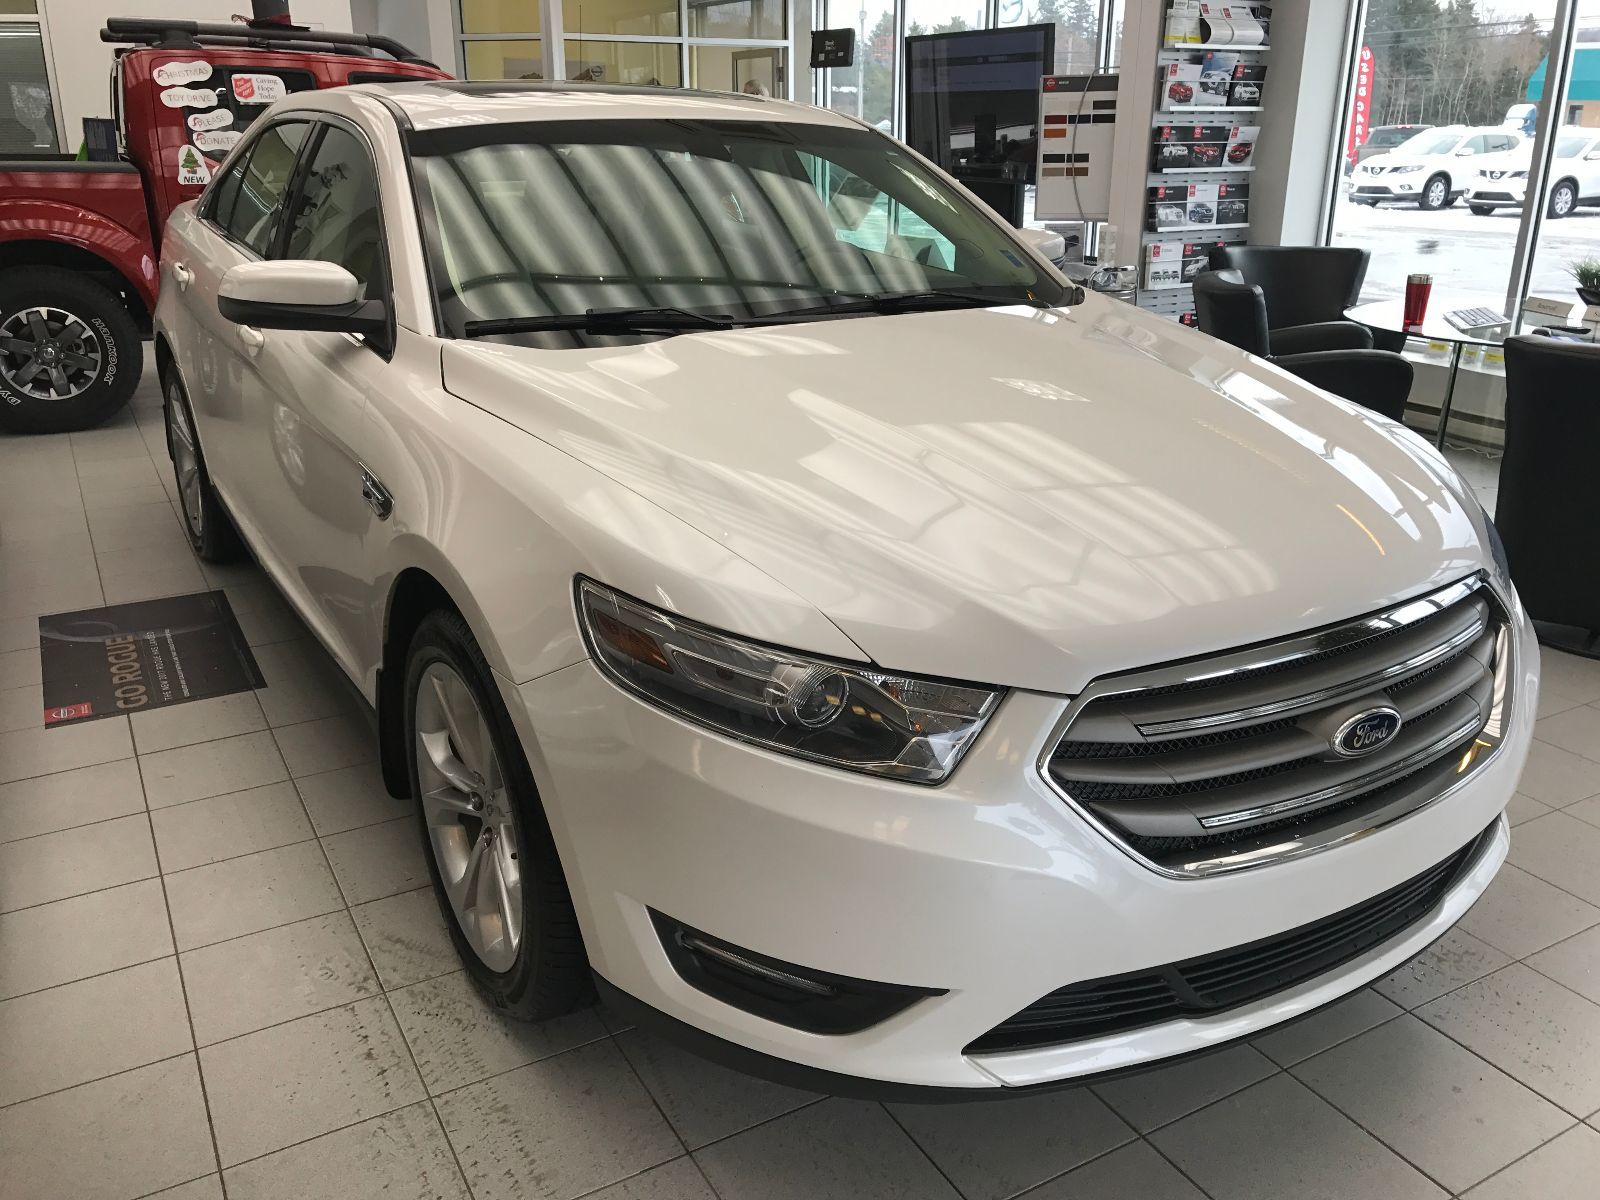 Used 2013 Ford Taurus SEL in Kentville Used inventory Kentville